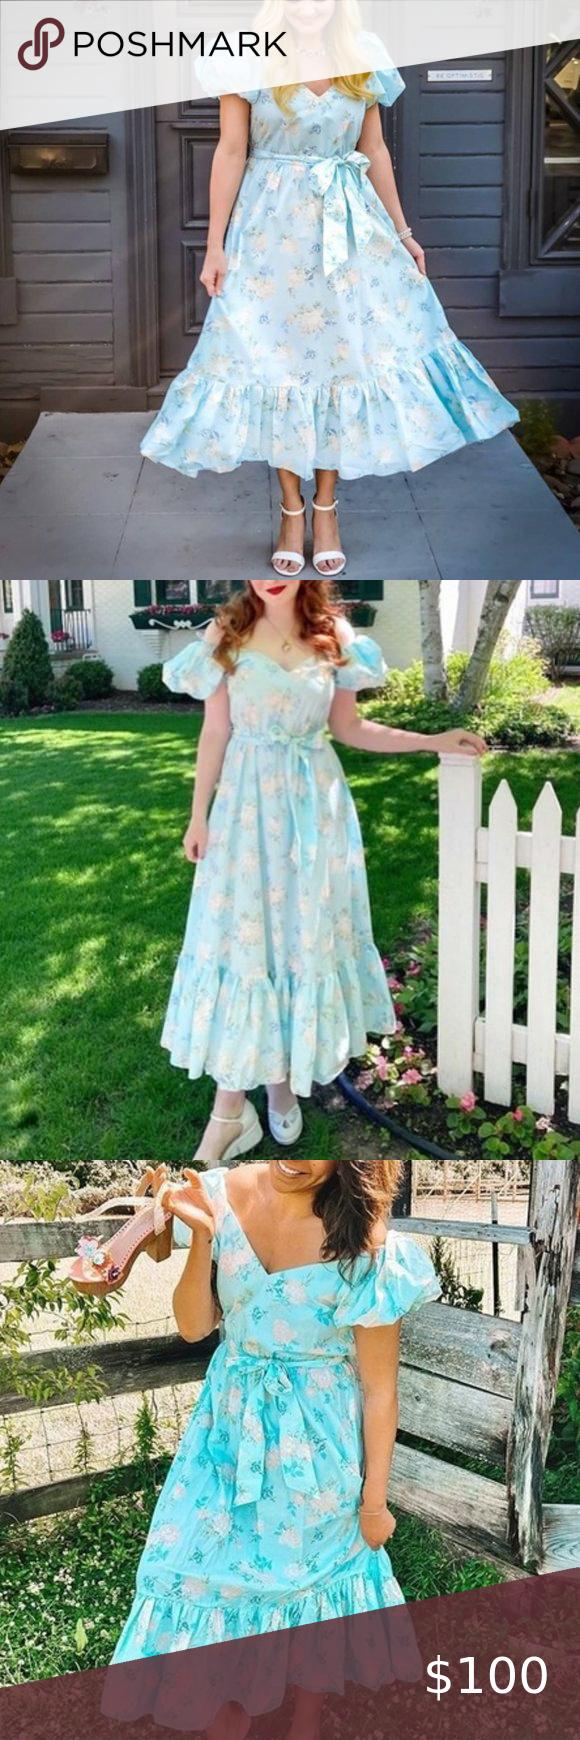 Loveshackfancy X Target Estelle Floral Dress Floral Blue Dress Floral Dress Dresses [ 1740 x 580 Pixel ]